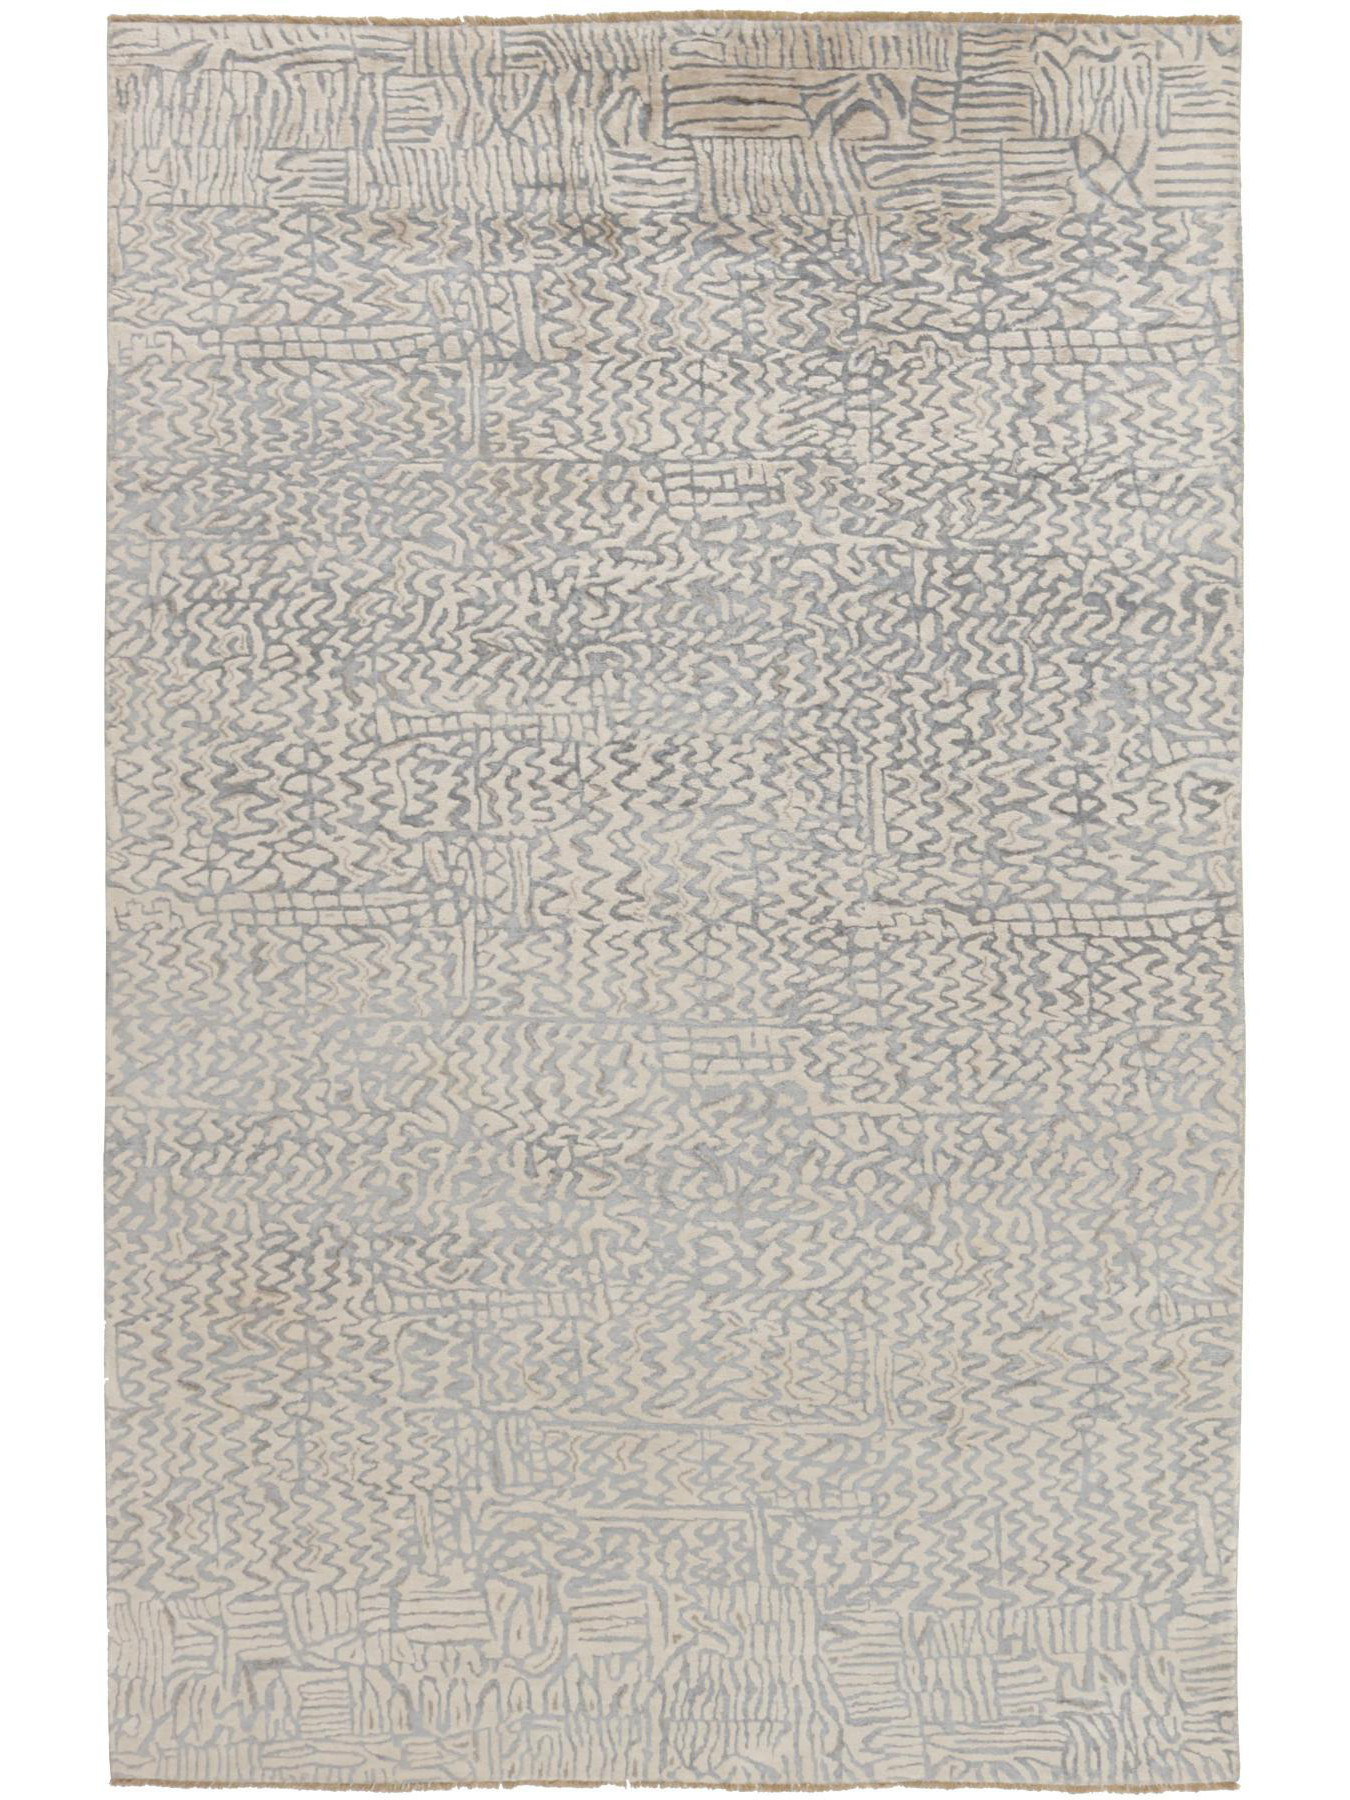 Luxury tapijten - Damask-AL-450 B-1/B-14/HB-35